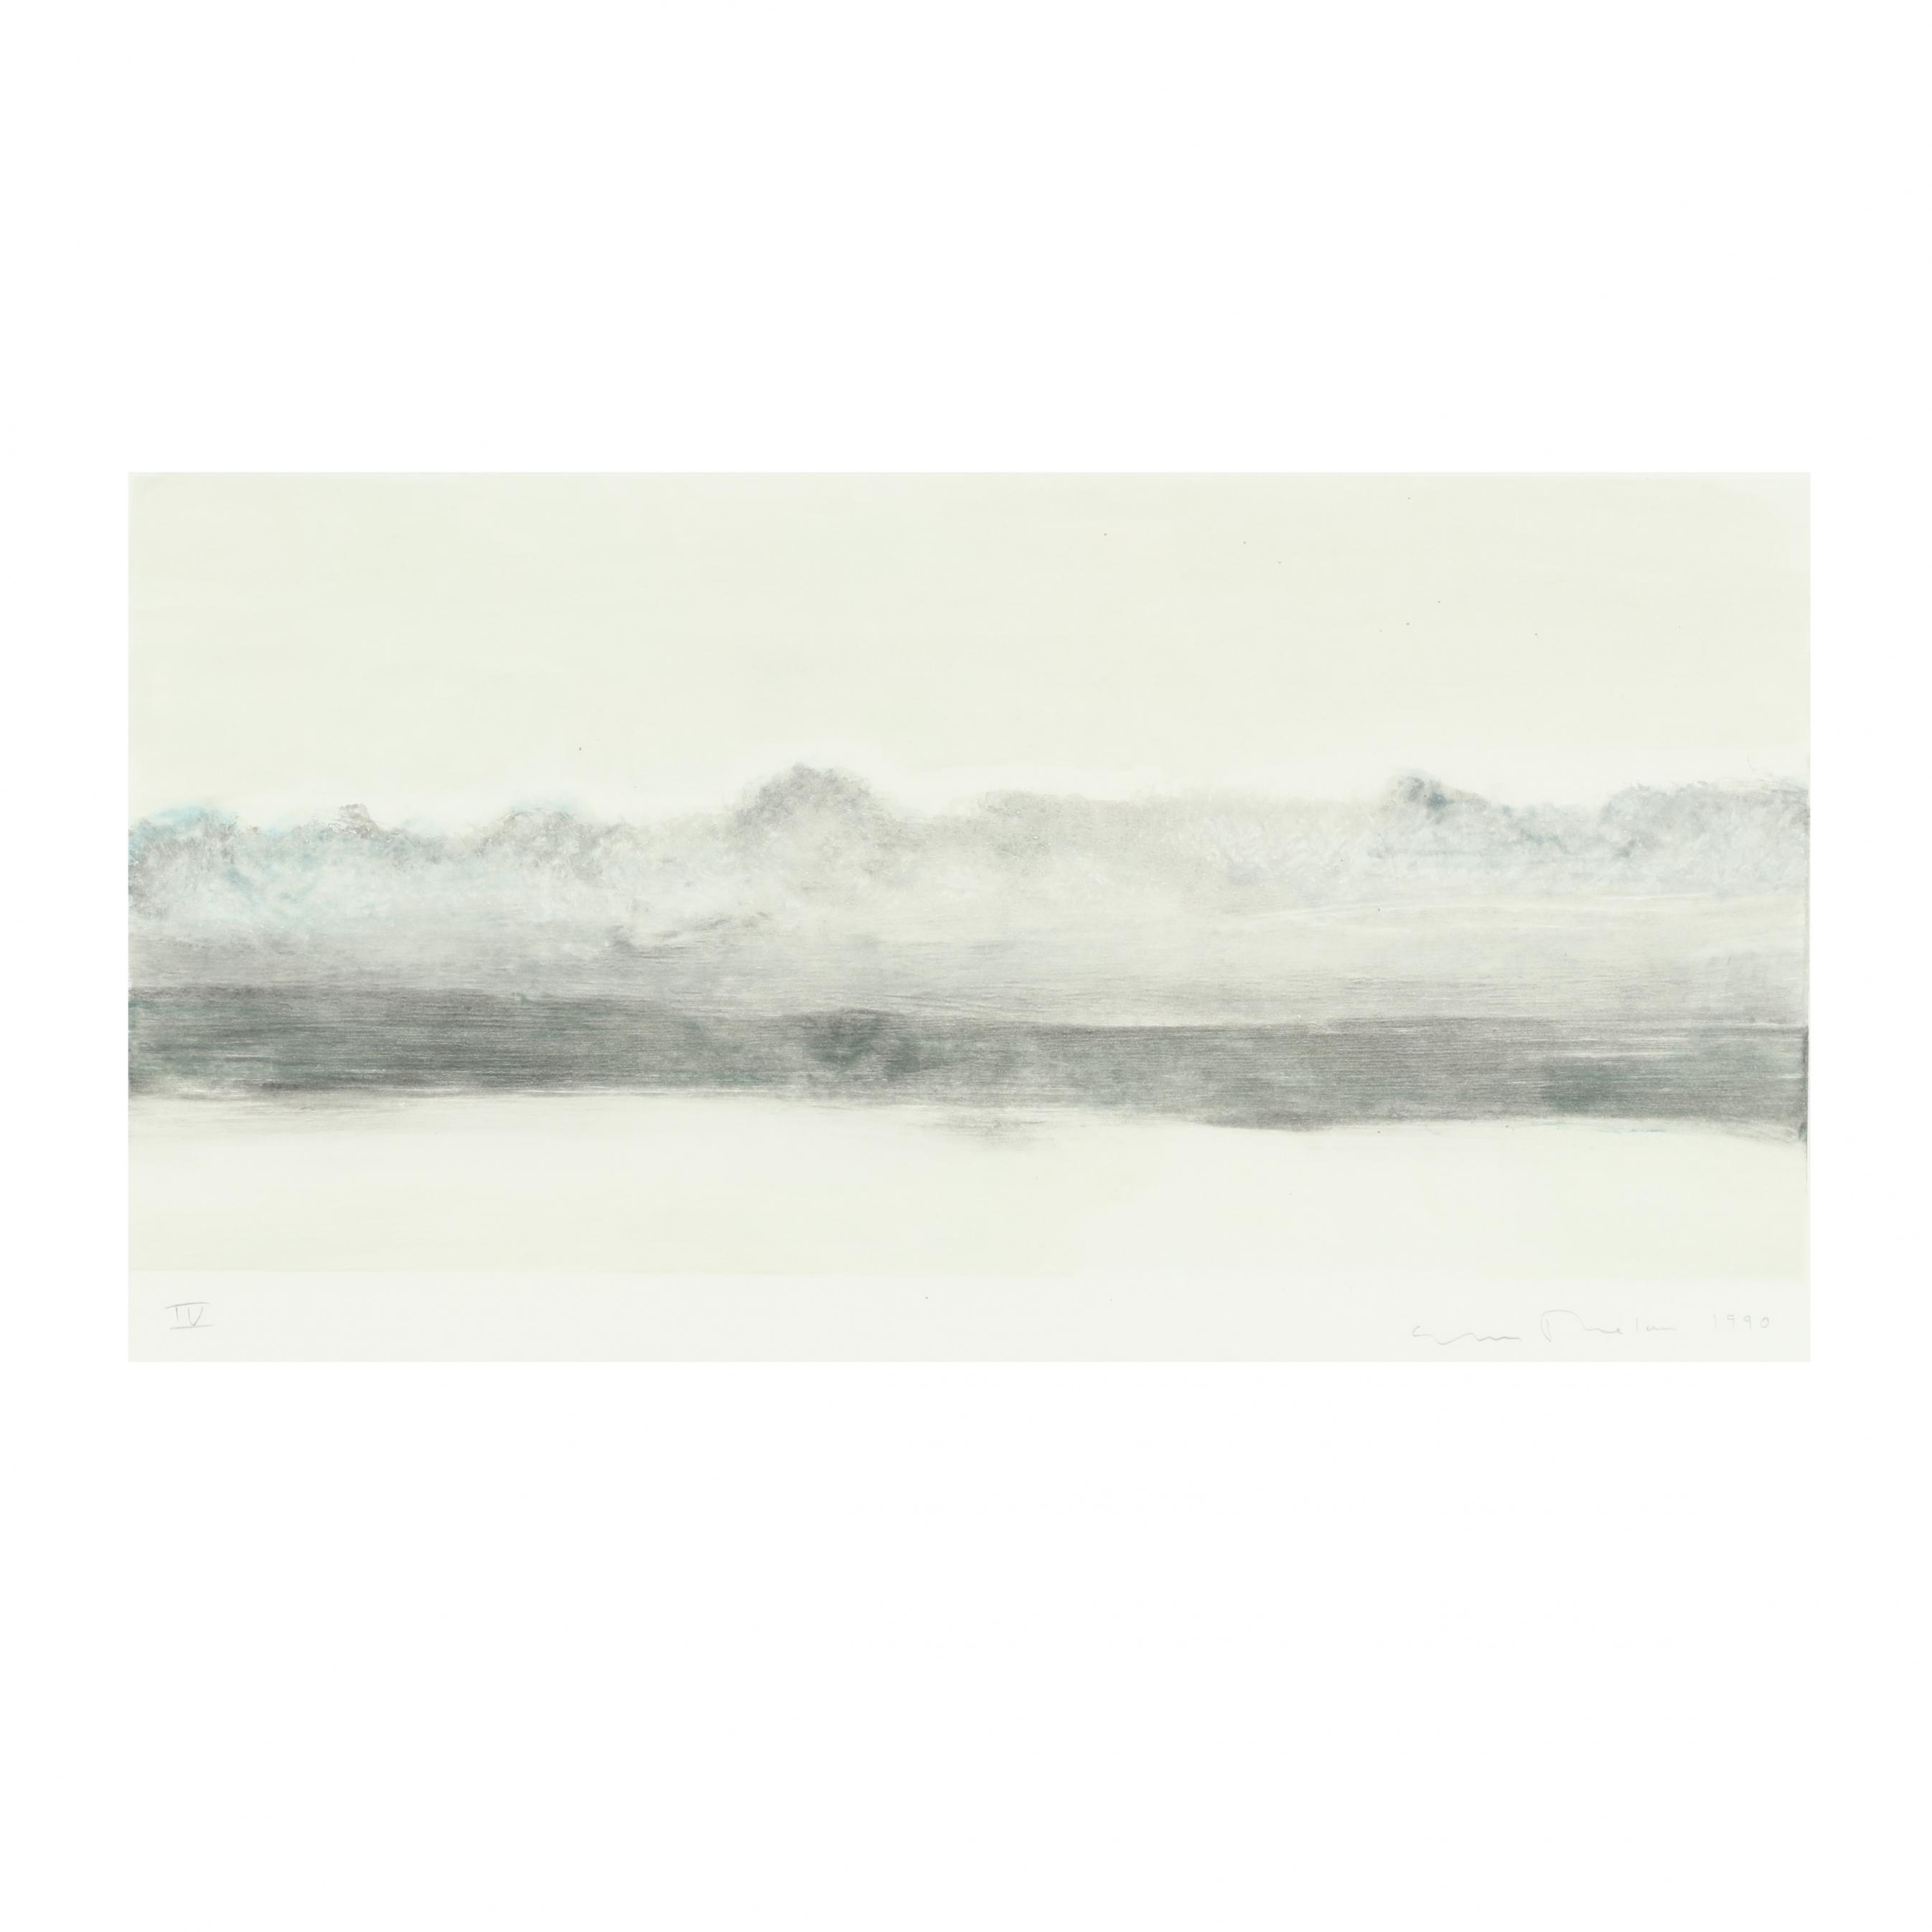 ellen-phelan-american-born-1943-landscape